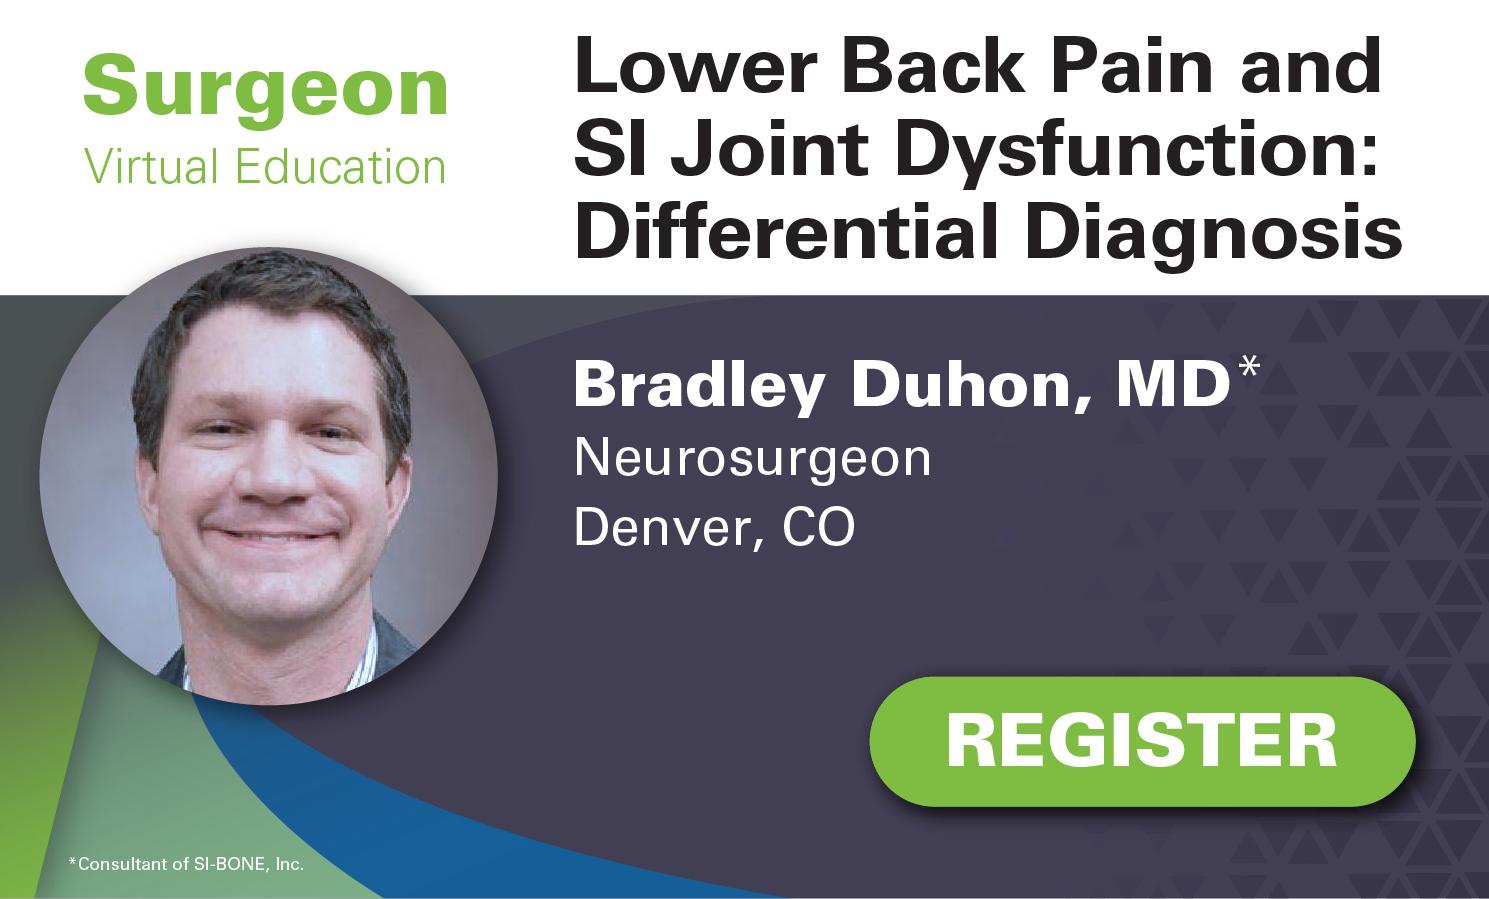 Virtual Ed - Apr 13 - Duhon - LBP & SIJF Differential Diagnosis